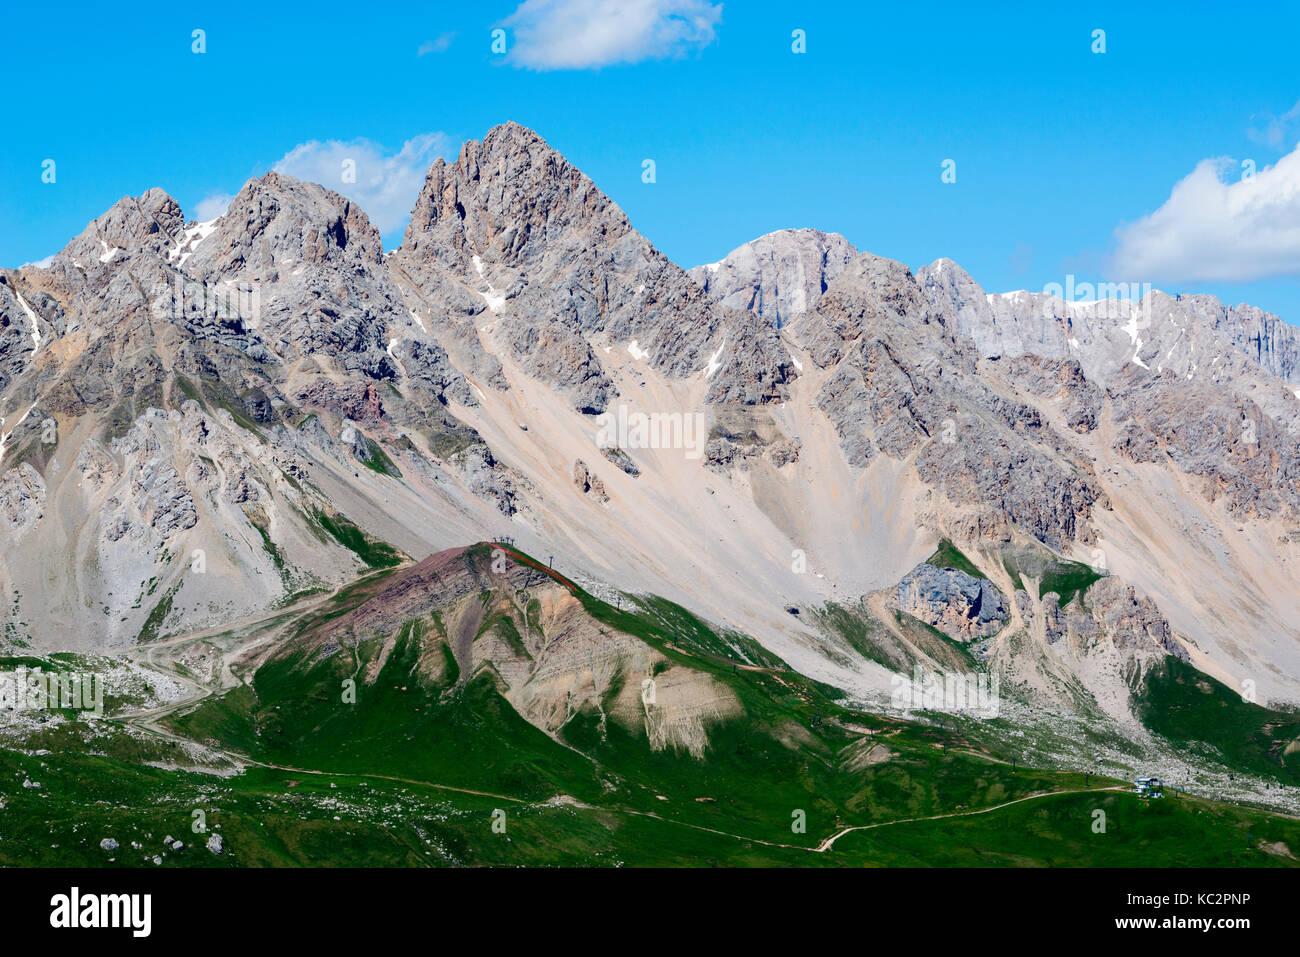 Uomo peak, San Pellegrino pass, Dolomites, Trentino Alto Adige, Italy Stock Photo